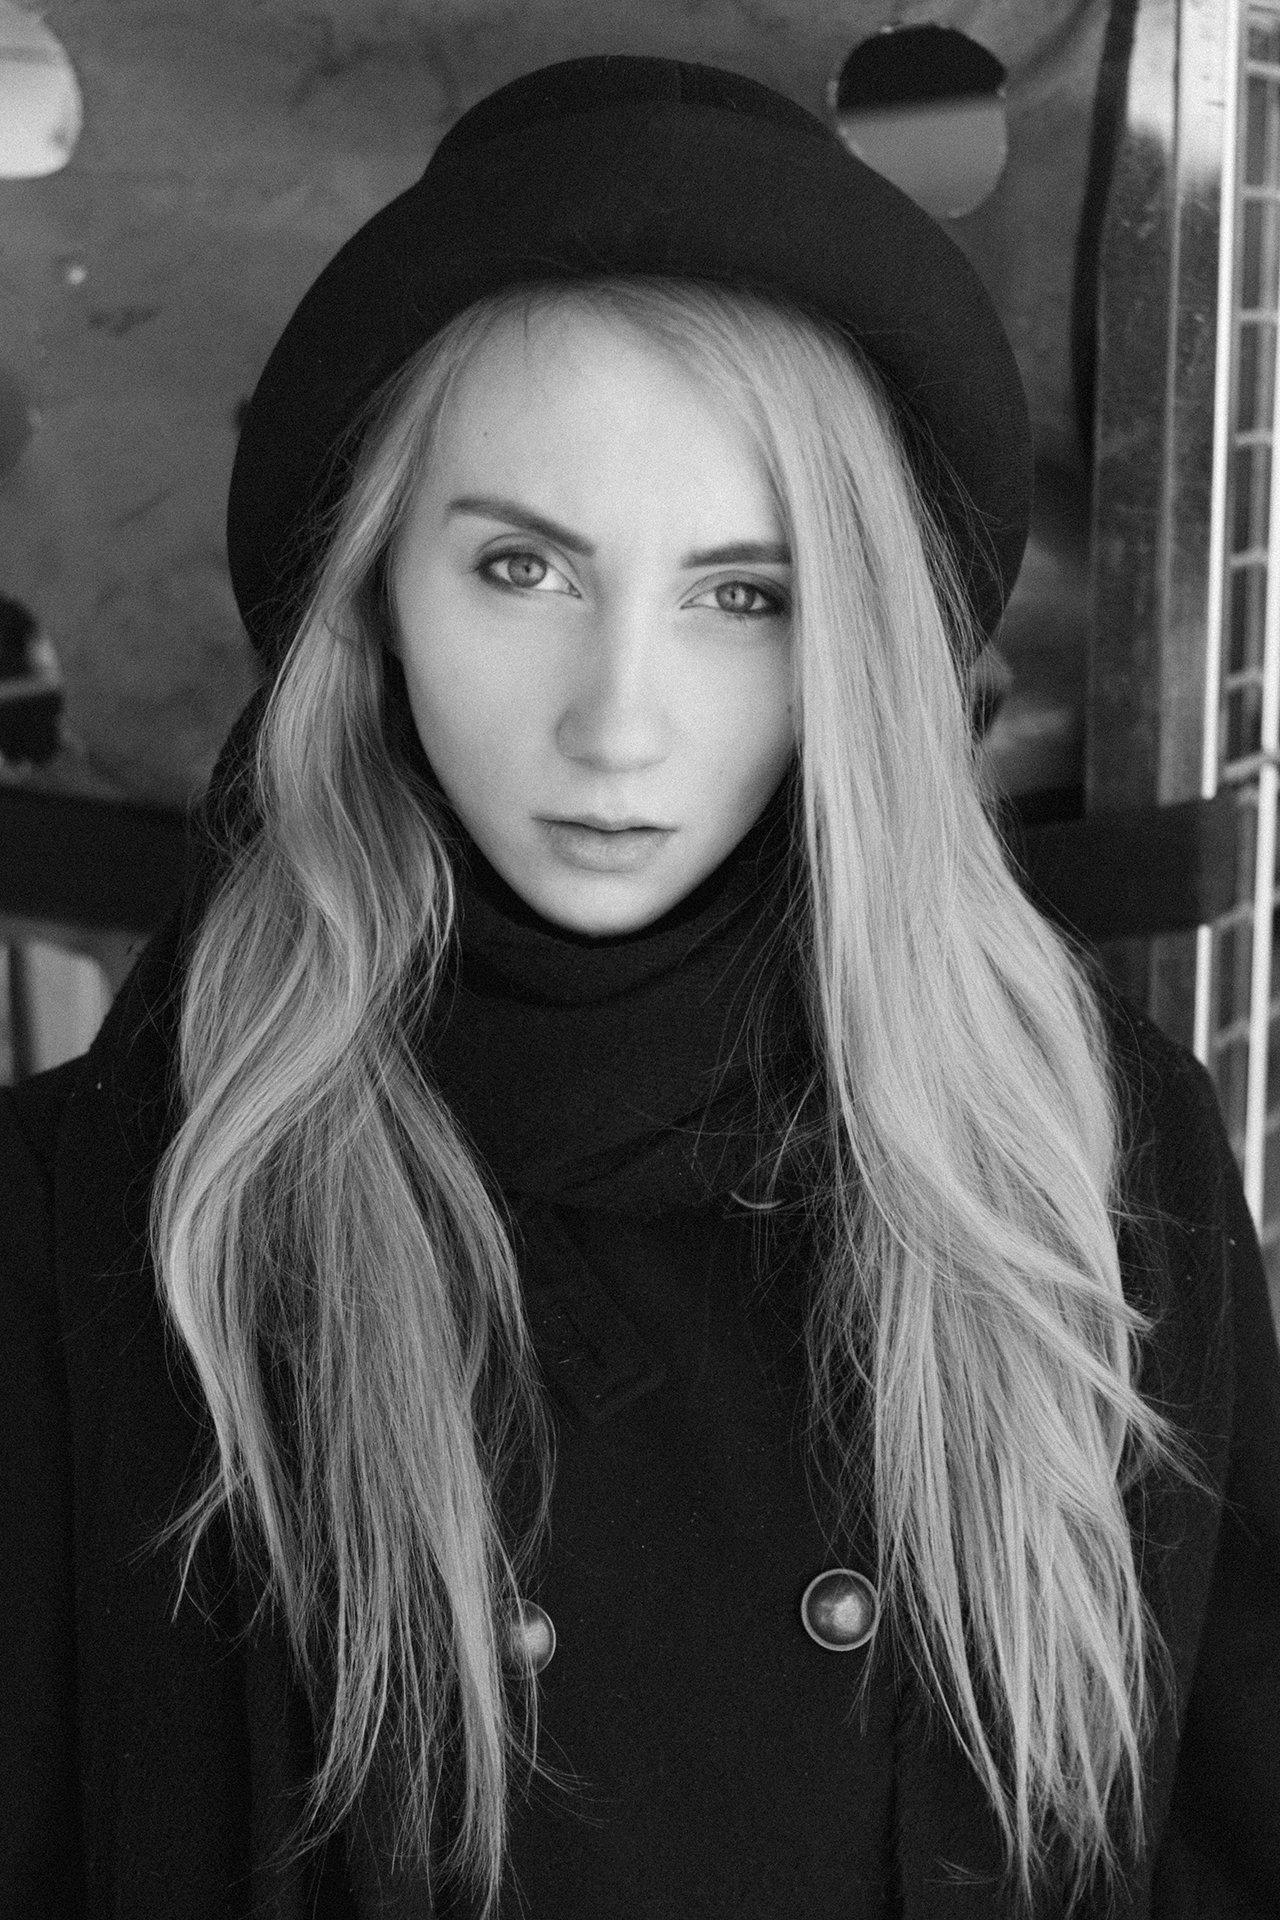 #girl #portrait #bw, Саврасов Сергей